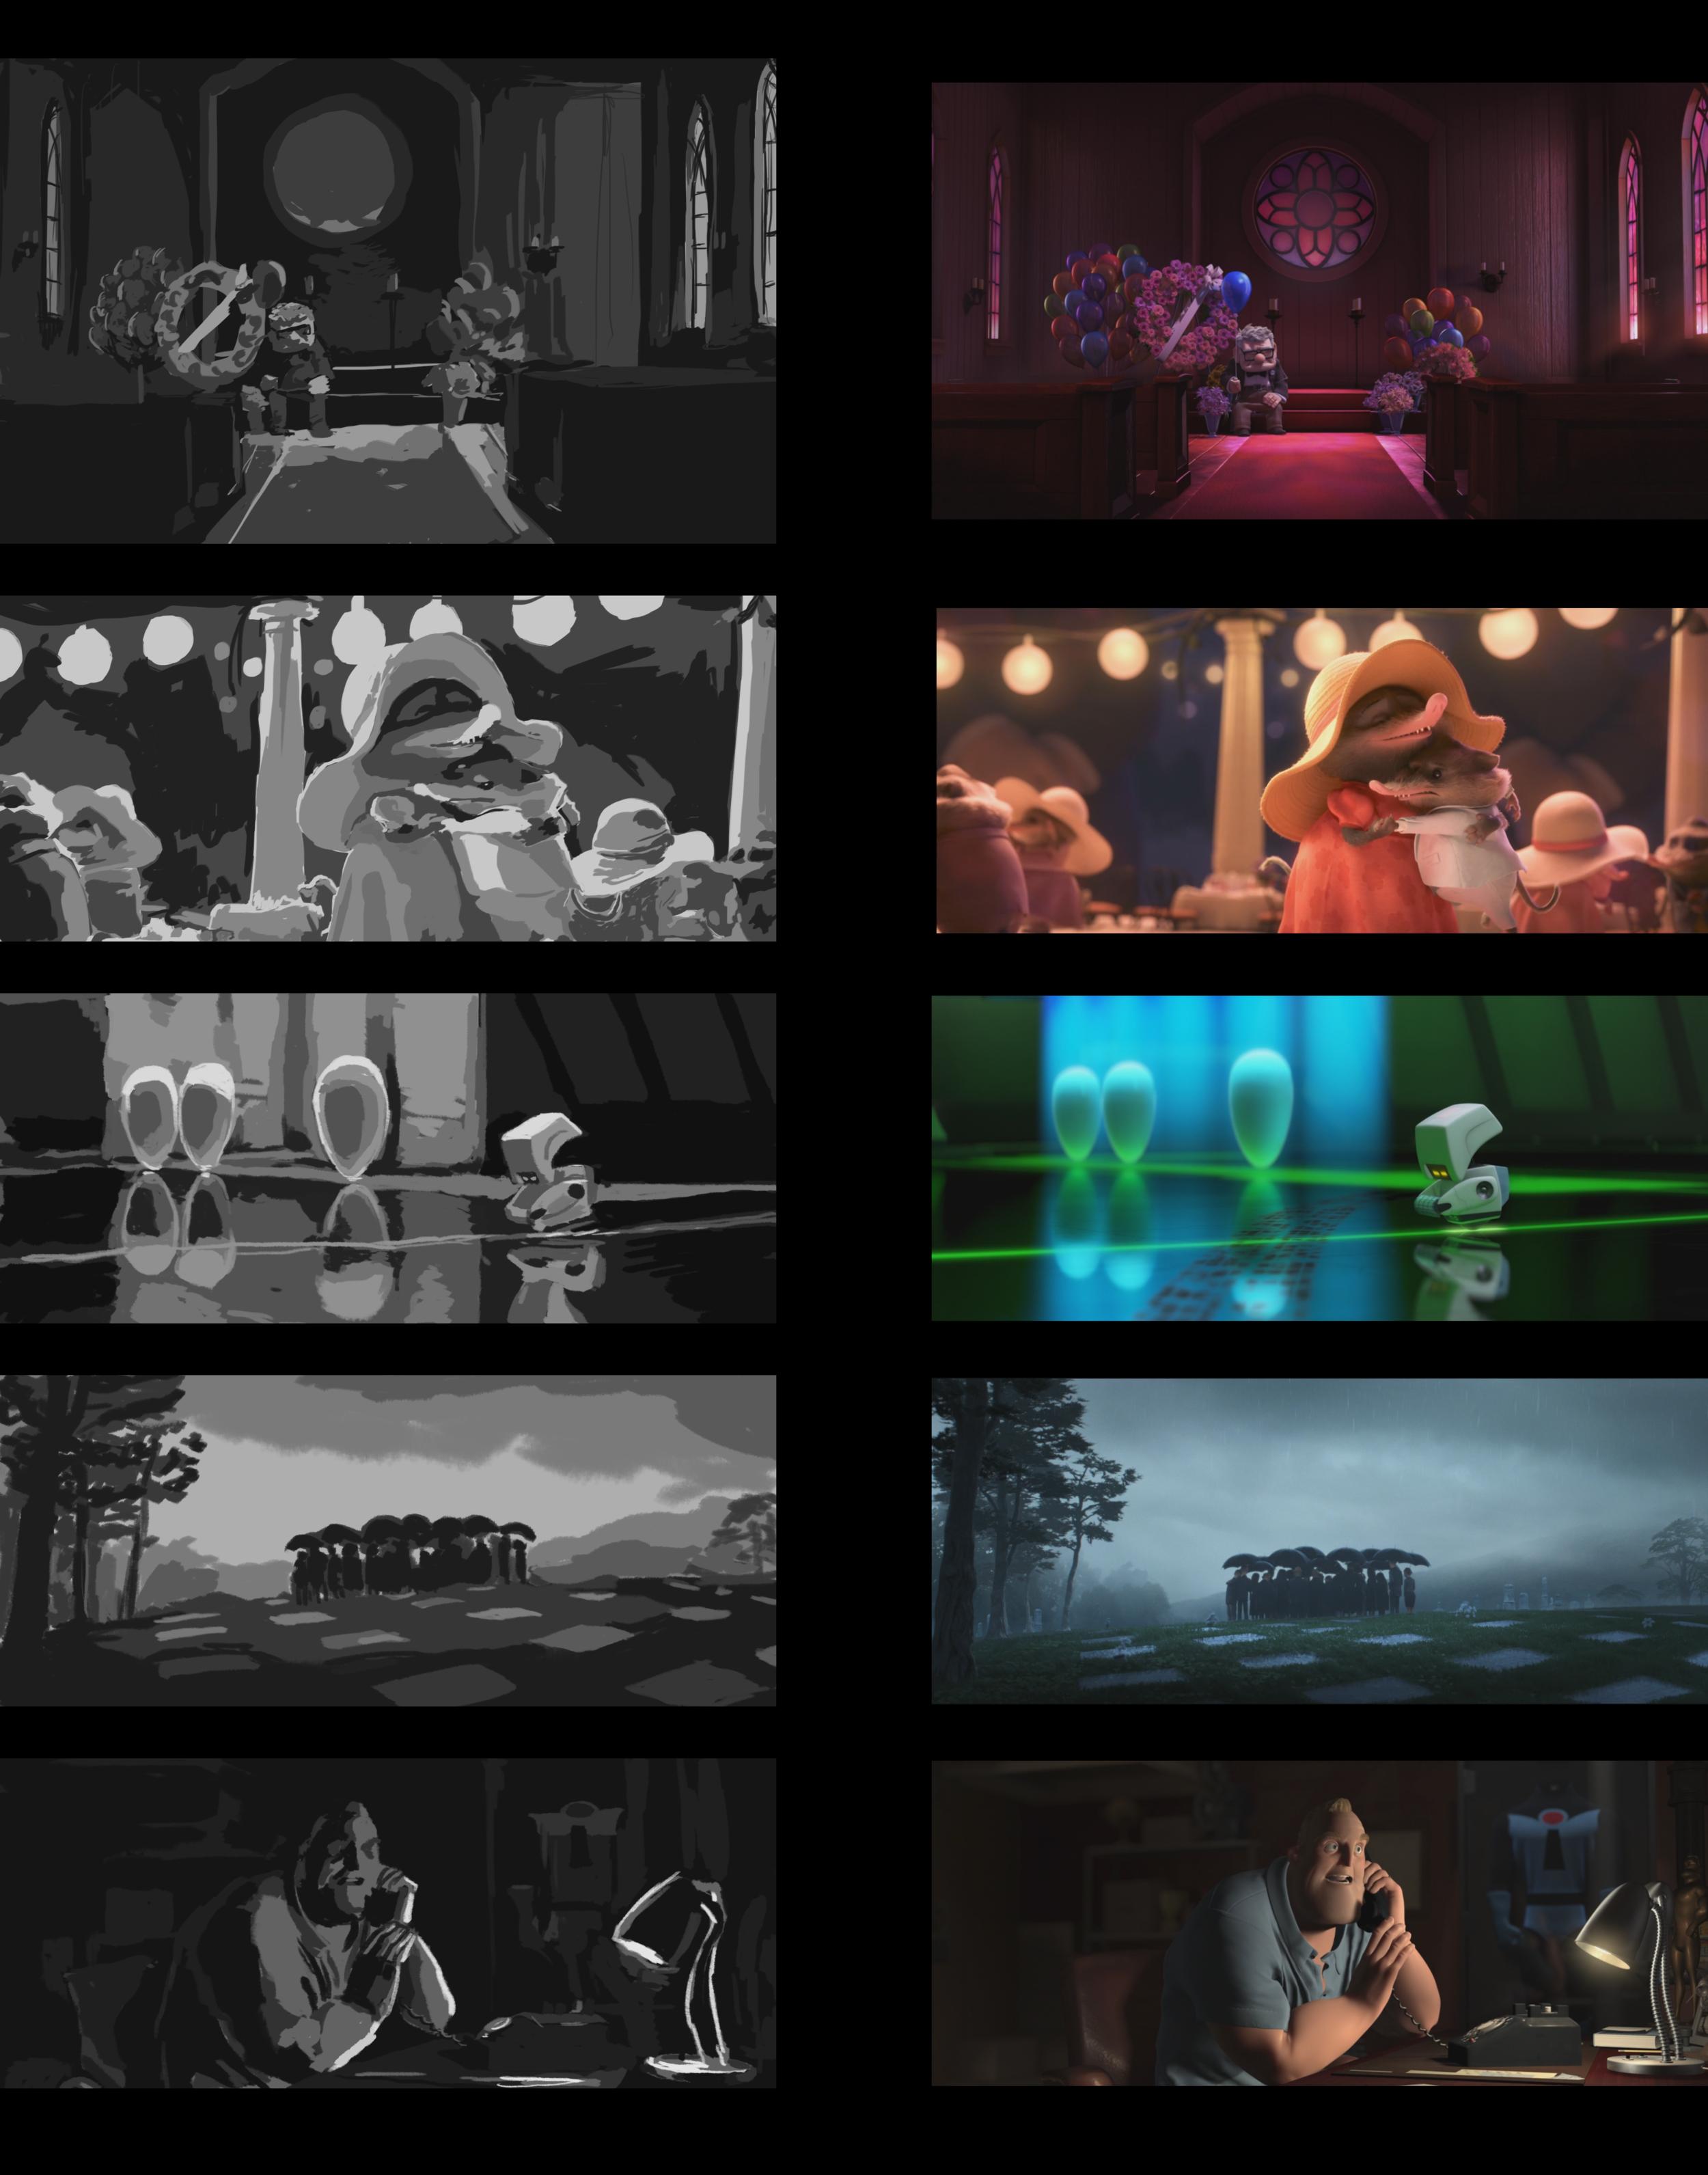 Pixar/Disney Value Studies